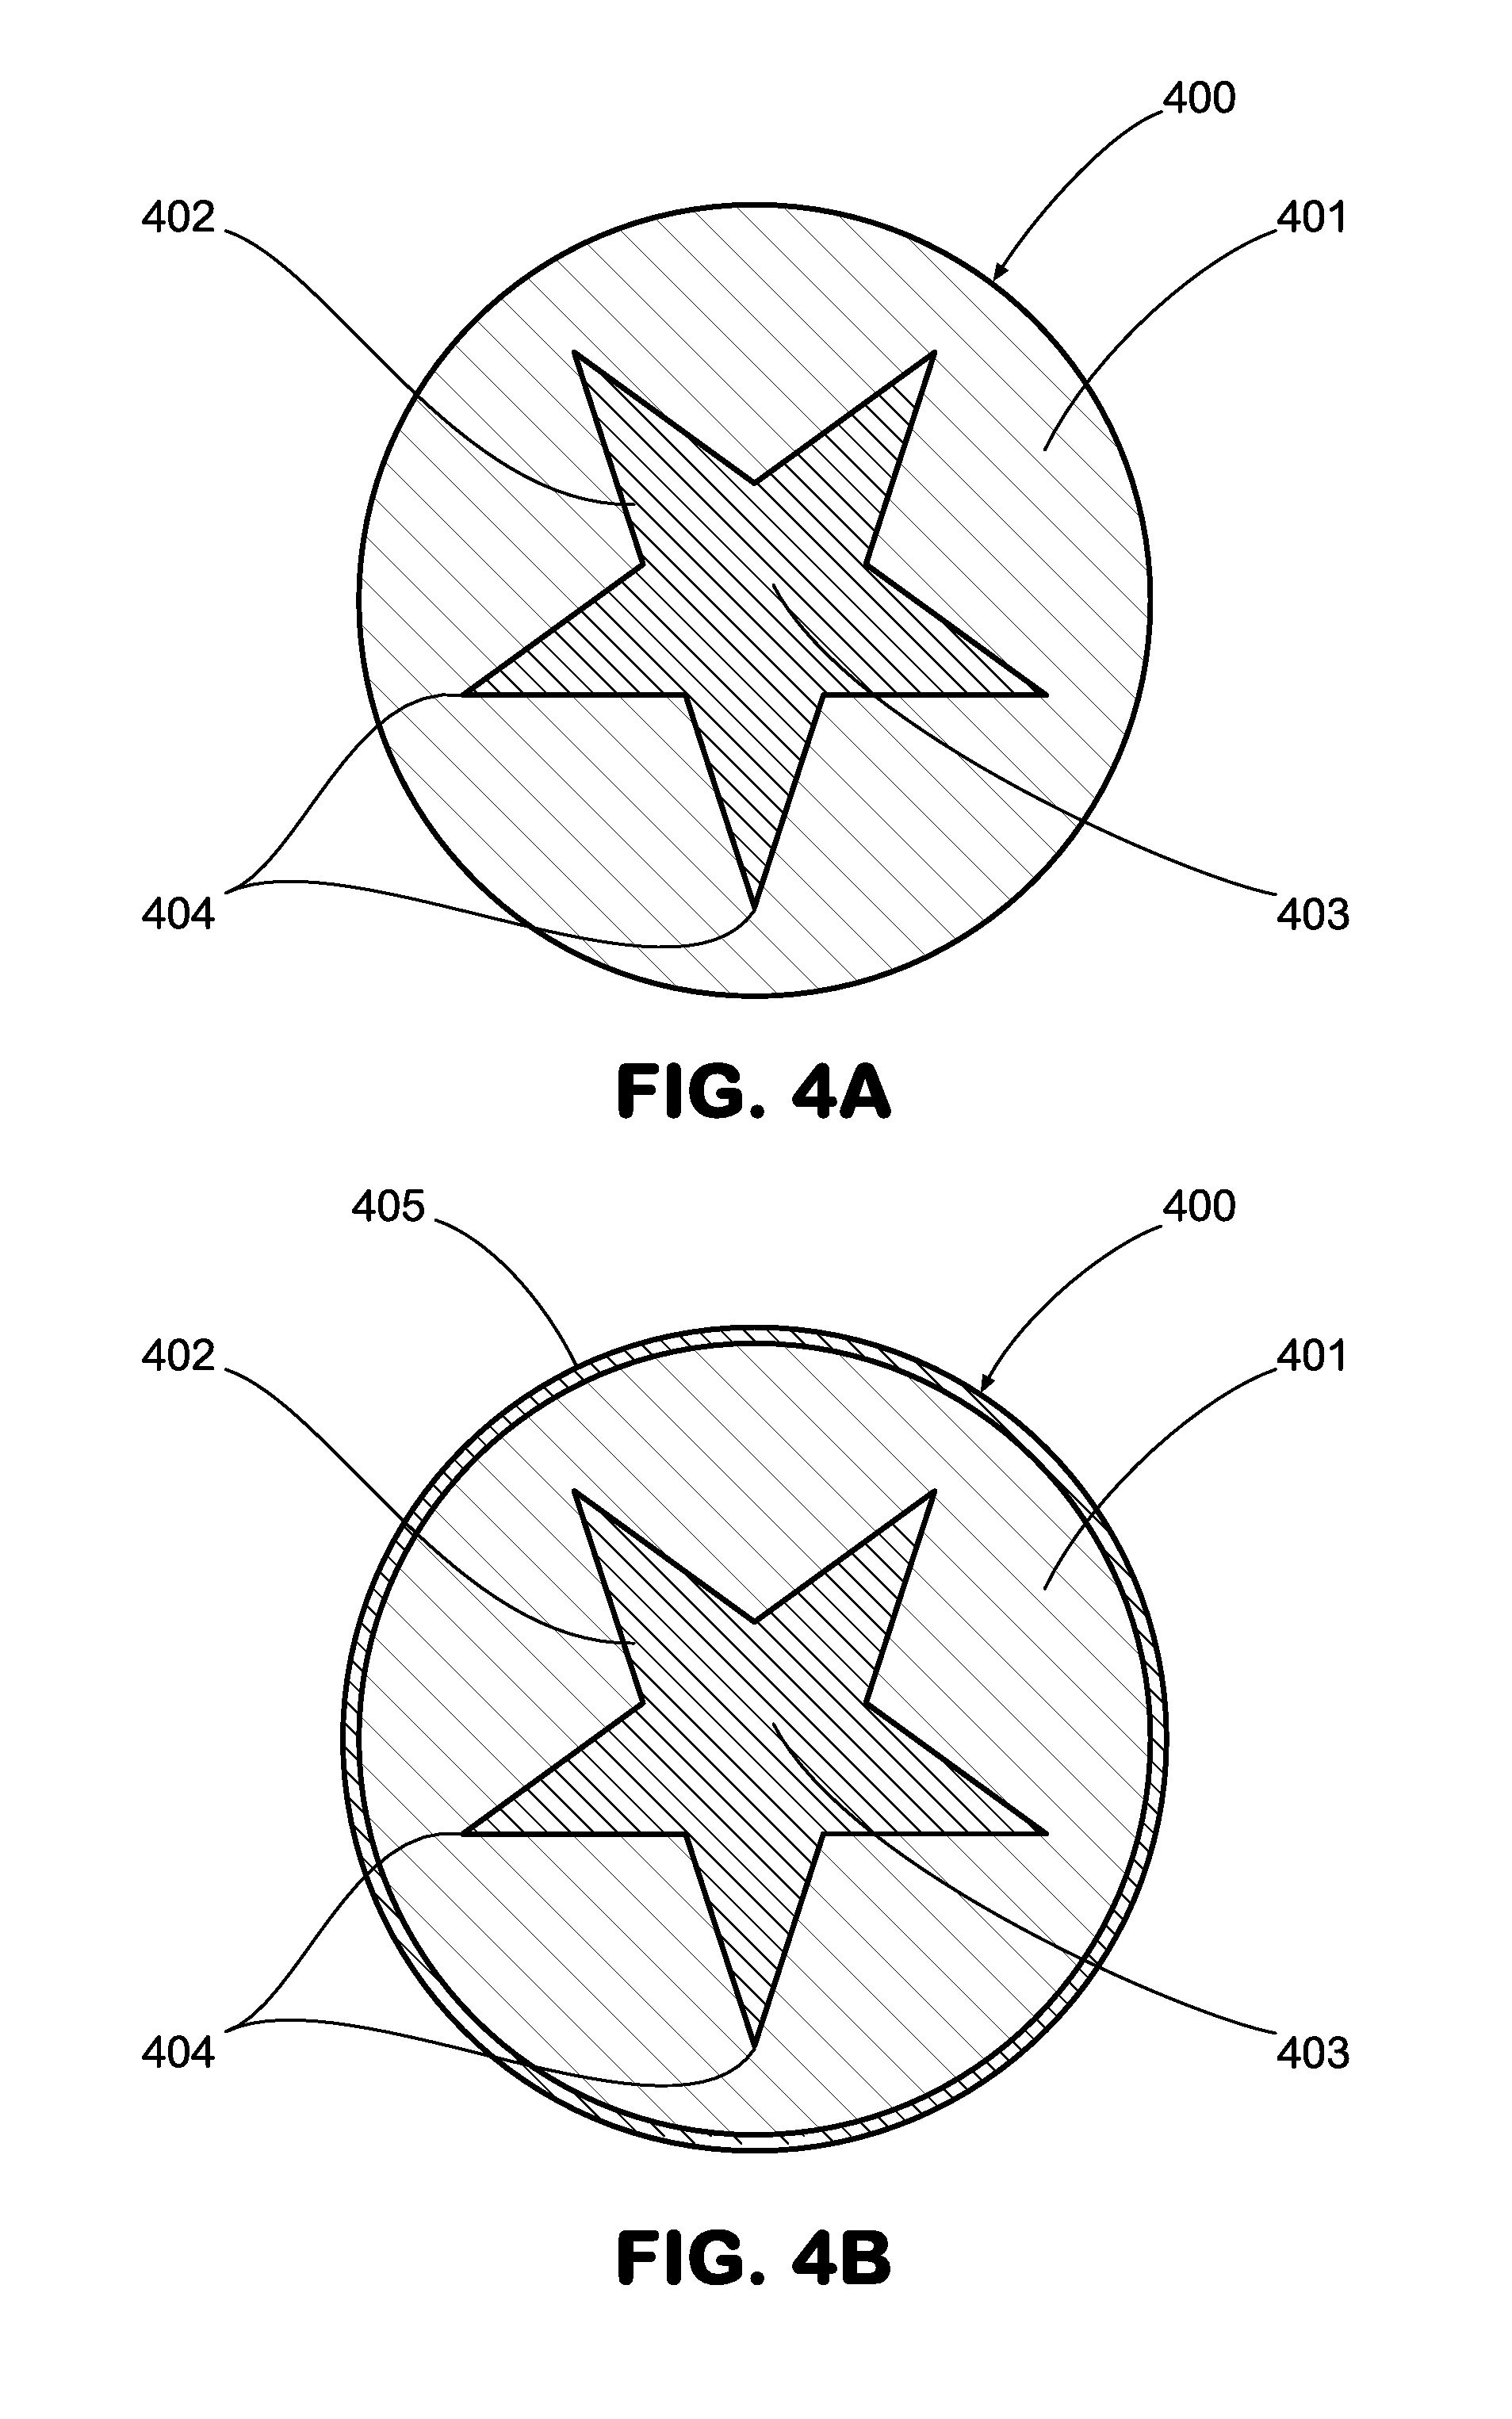 non newtonian fluid molecular structure. patent drawing non newtonian fluid molecular structure